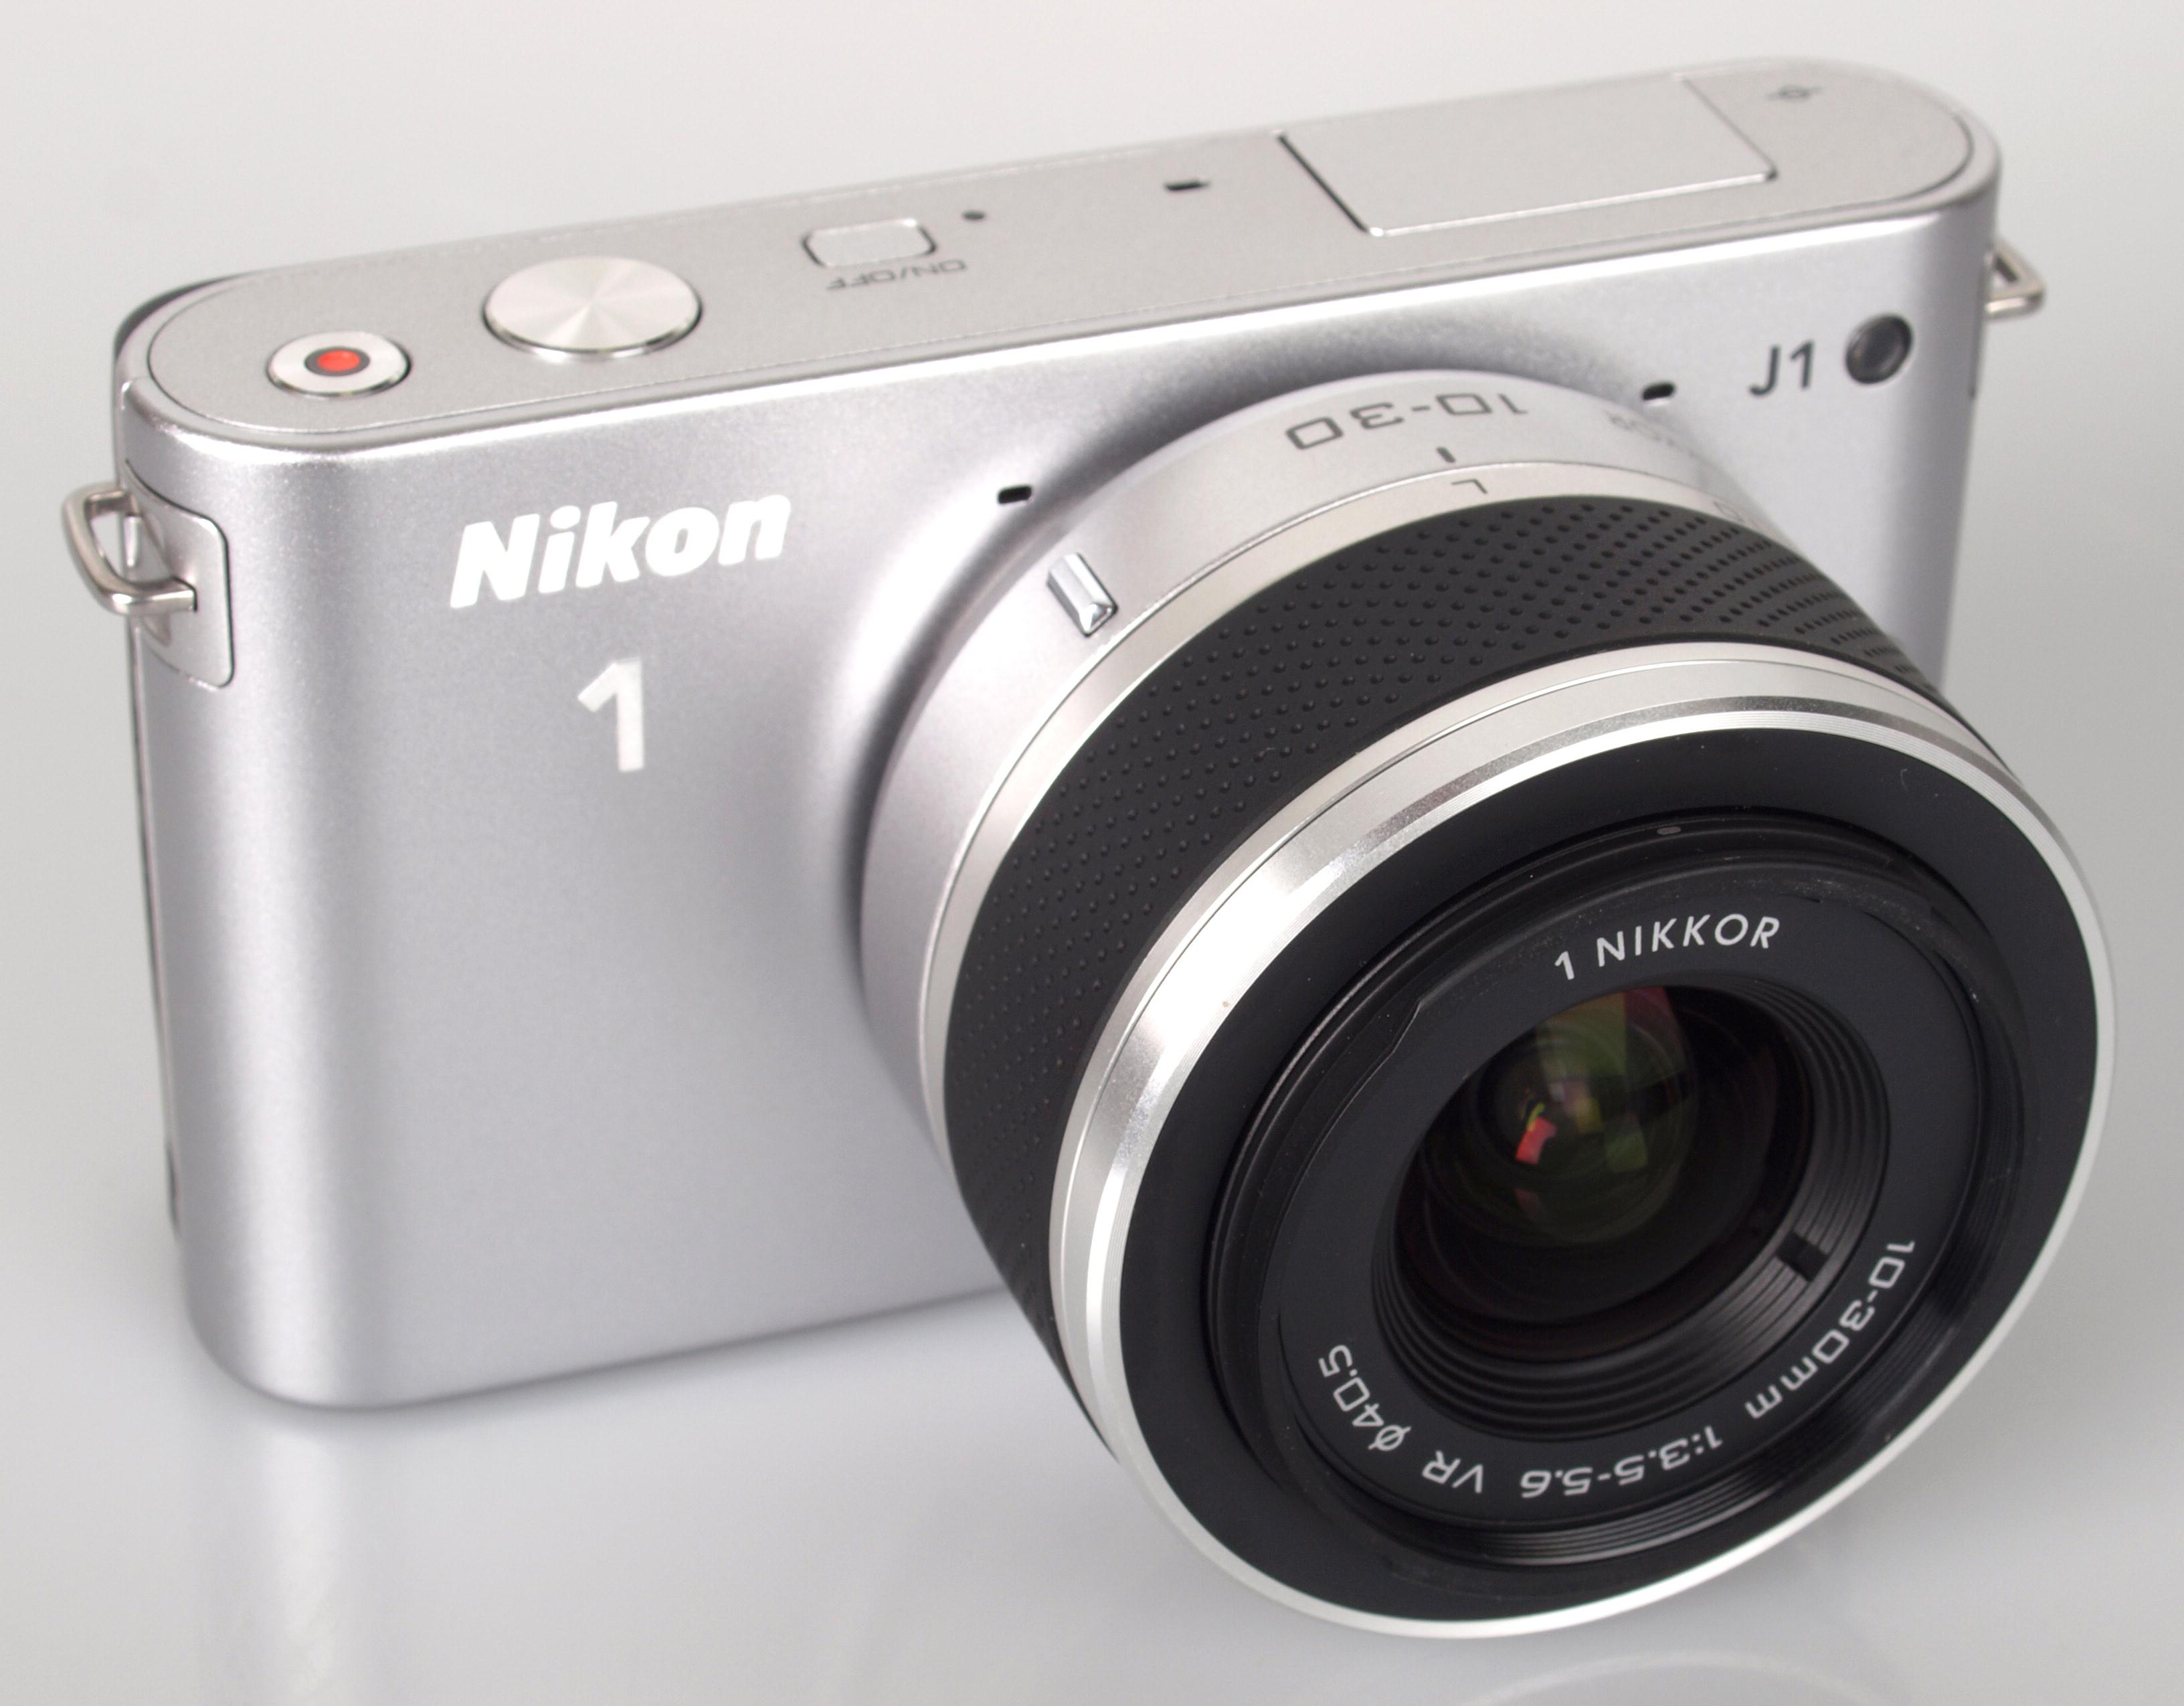 Jessops Offer ?200 To Nikon 1 Buyers